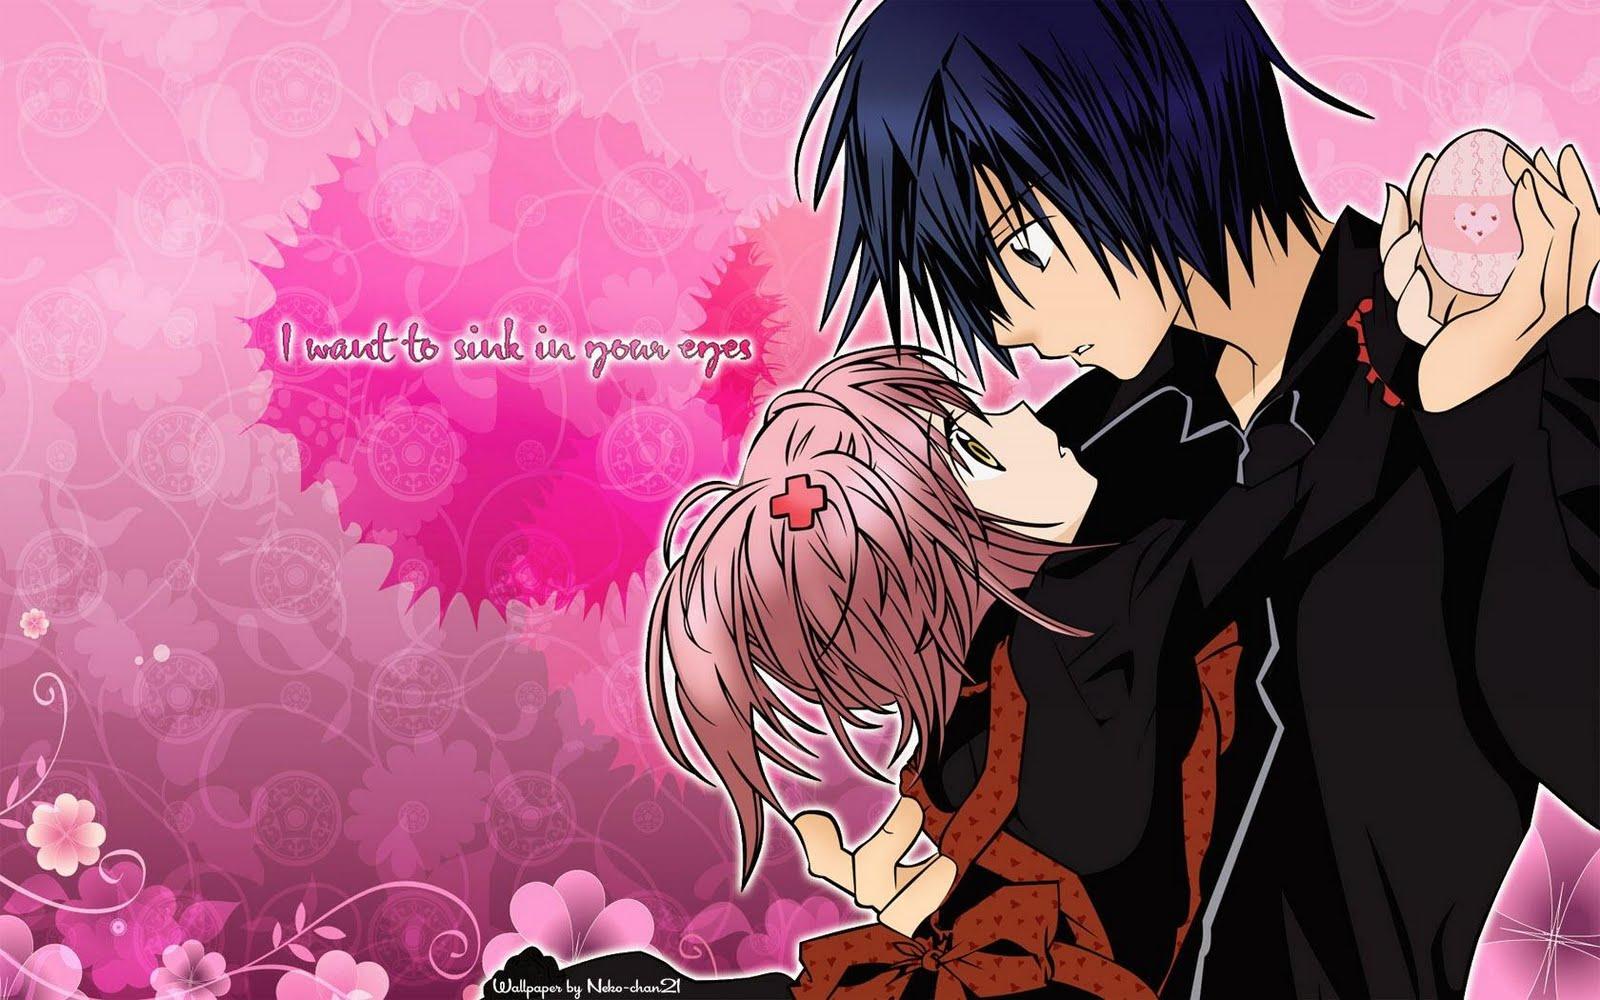 http://2.bp.blogspot.com/_0NP7OeZosa8/S7ZHm4nGOVI/AAAAAAAADPE/xFiepRlUUt0/s1600/[AnimePaper]wallpapers_Shugo-Chara_Neko-chan21(1.JPG